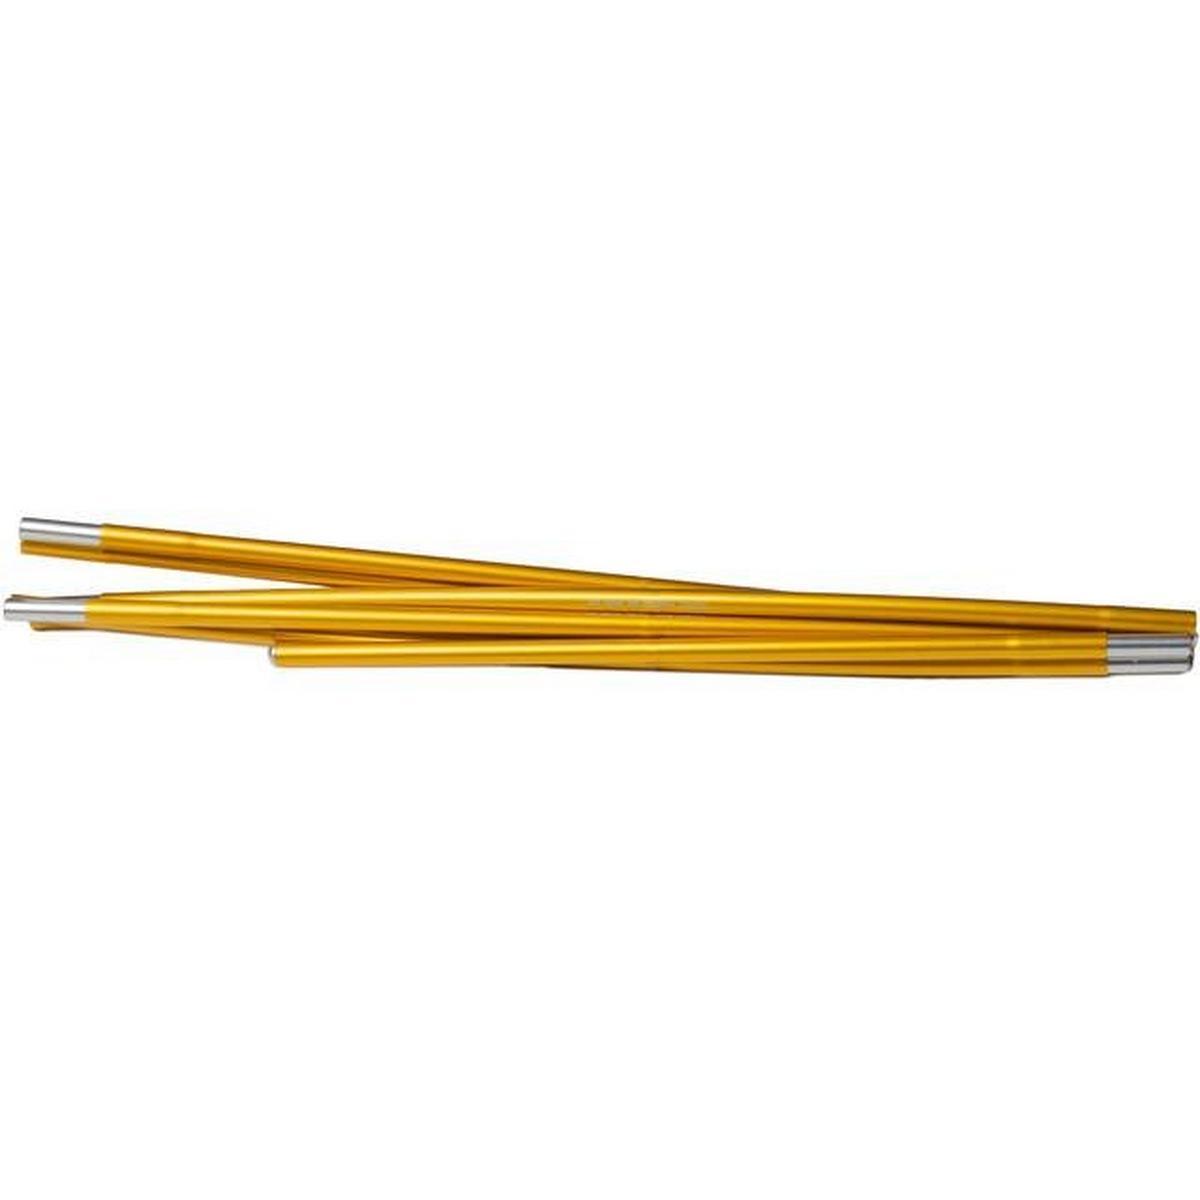 Hilleberg Unna Spare Pole 9mm x 387cm